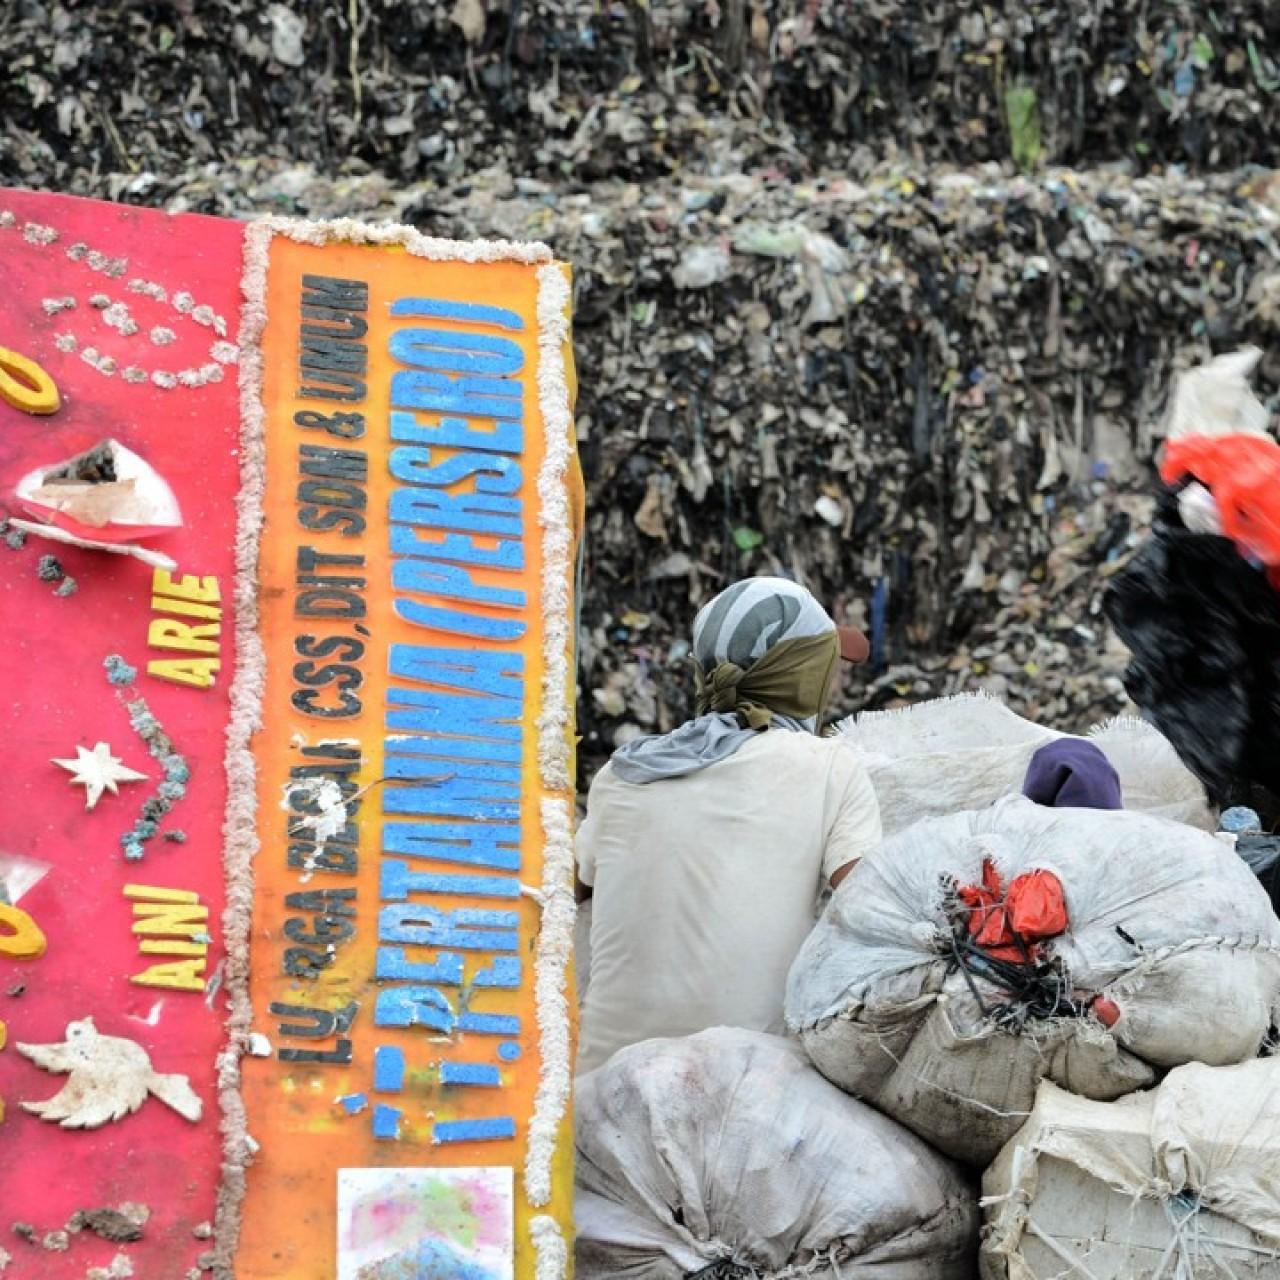 Indonesians living near Jakarta's giant dump want more